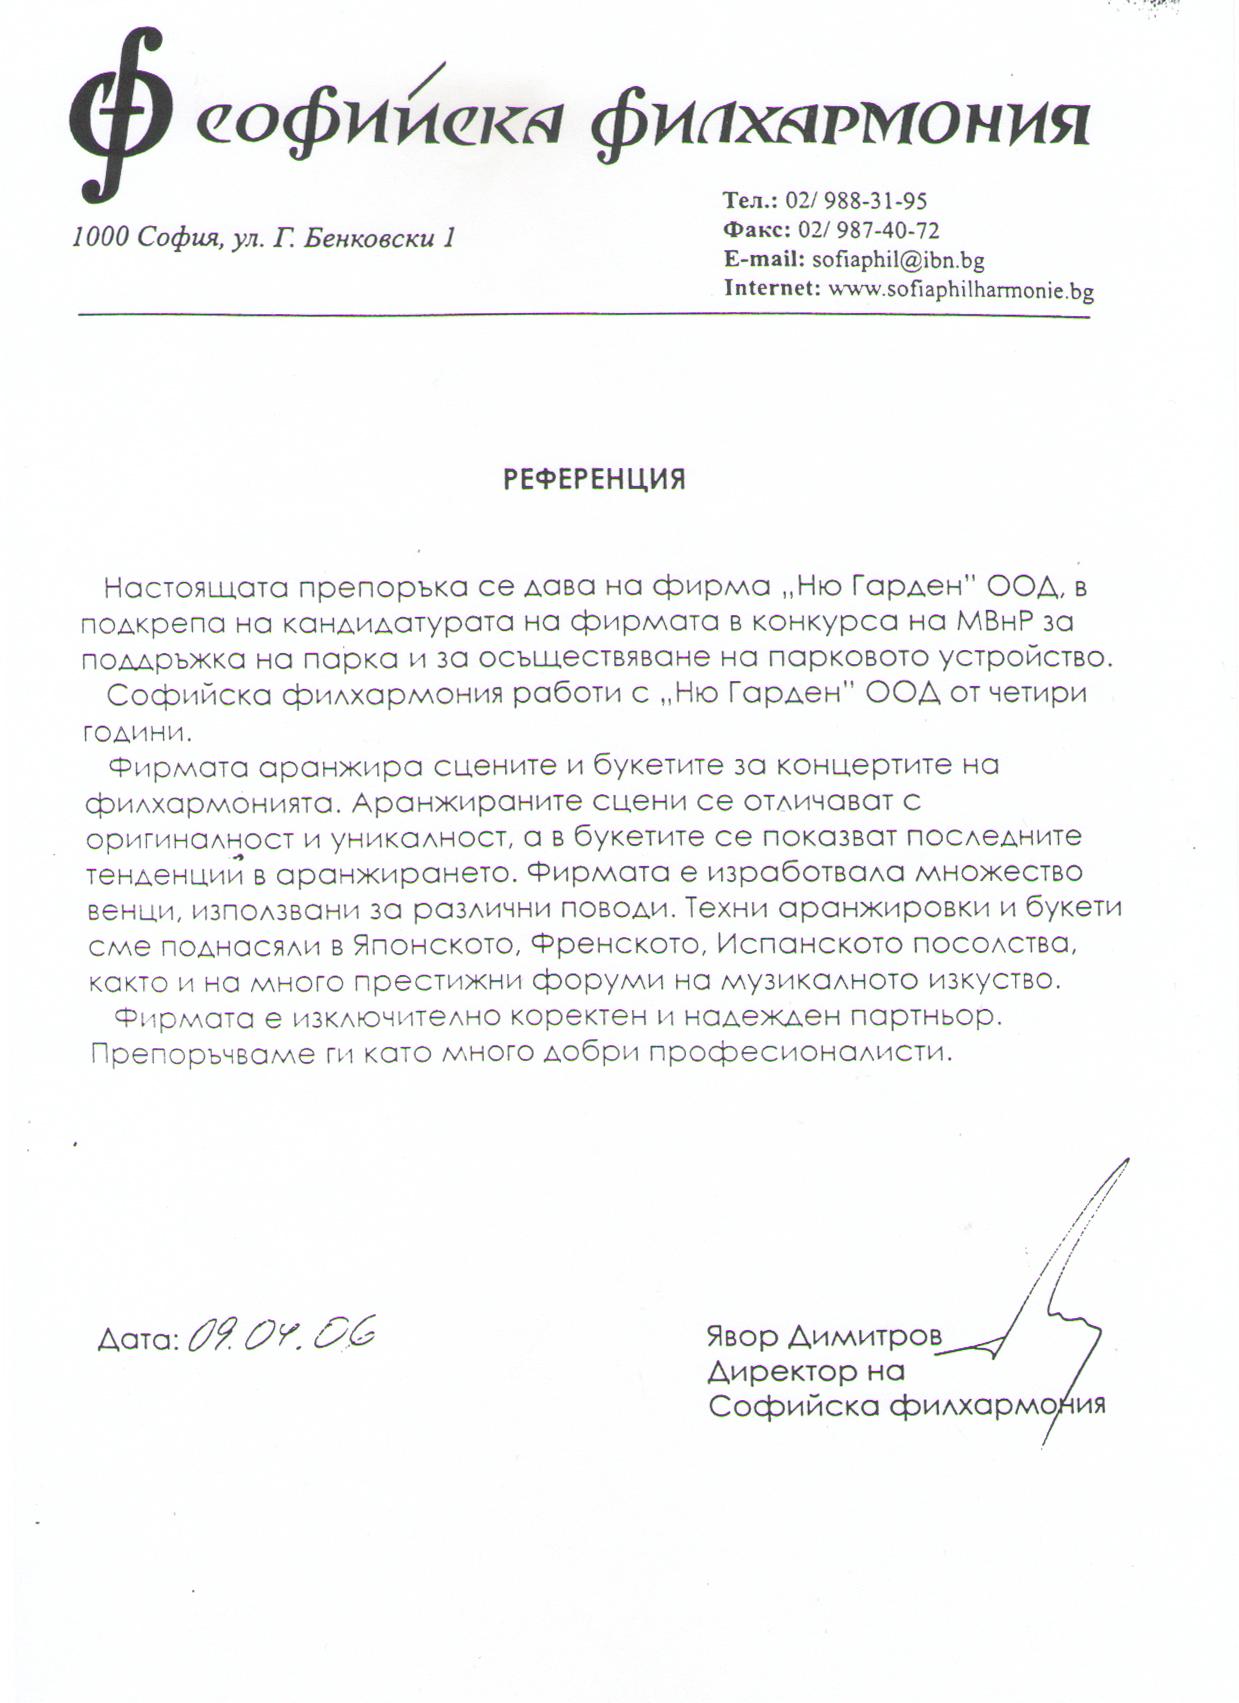 Референция за озеленяване от Софийска Филхармония